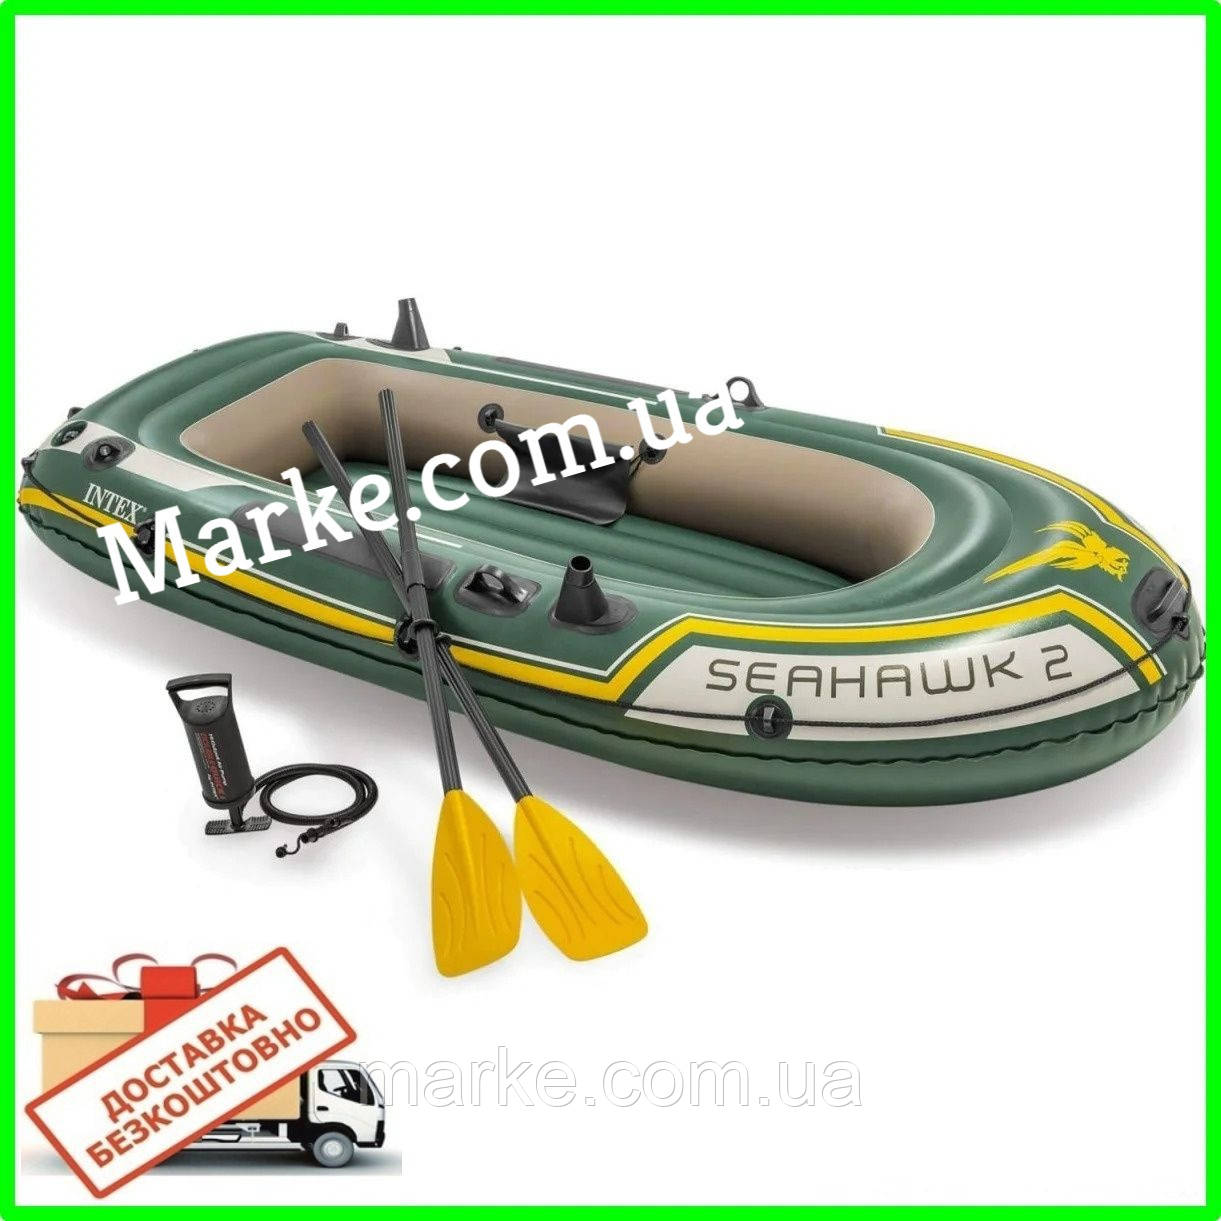 ПЕРЕСЫЛКА 0! Двухместная надувная лодка Intex 68347 Seahawk 2 Set